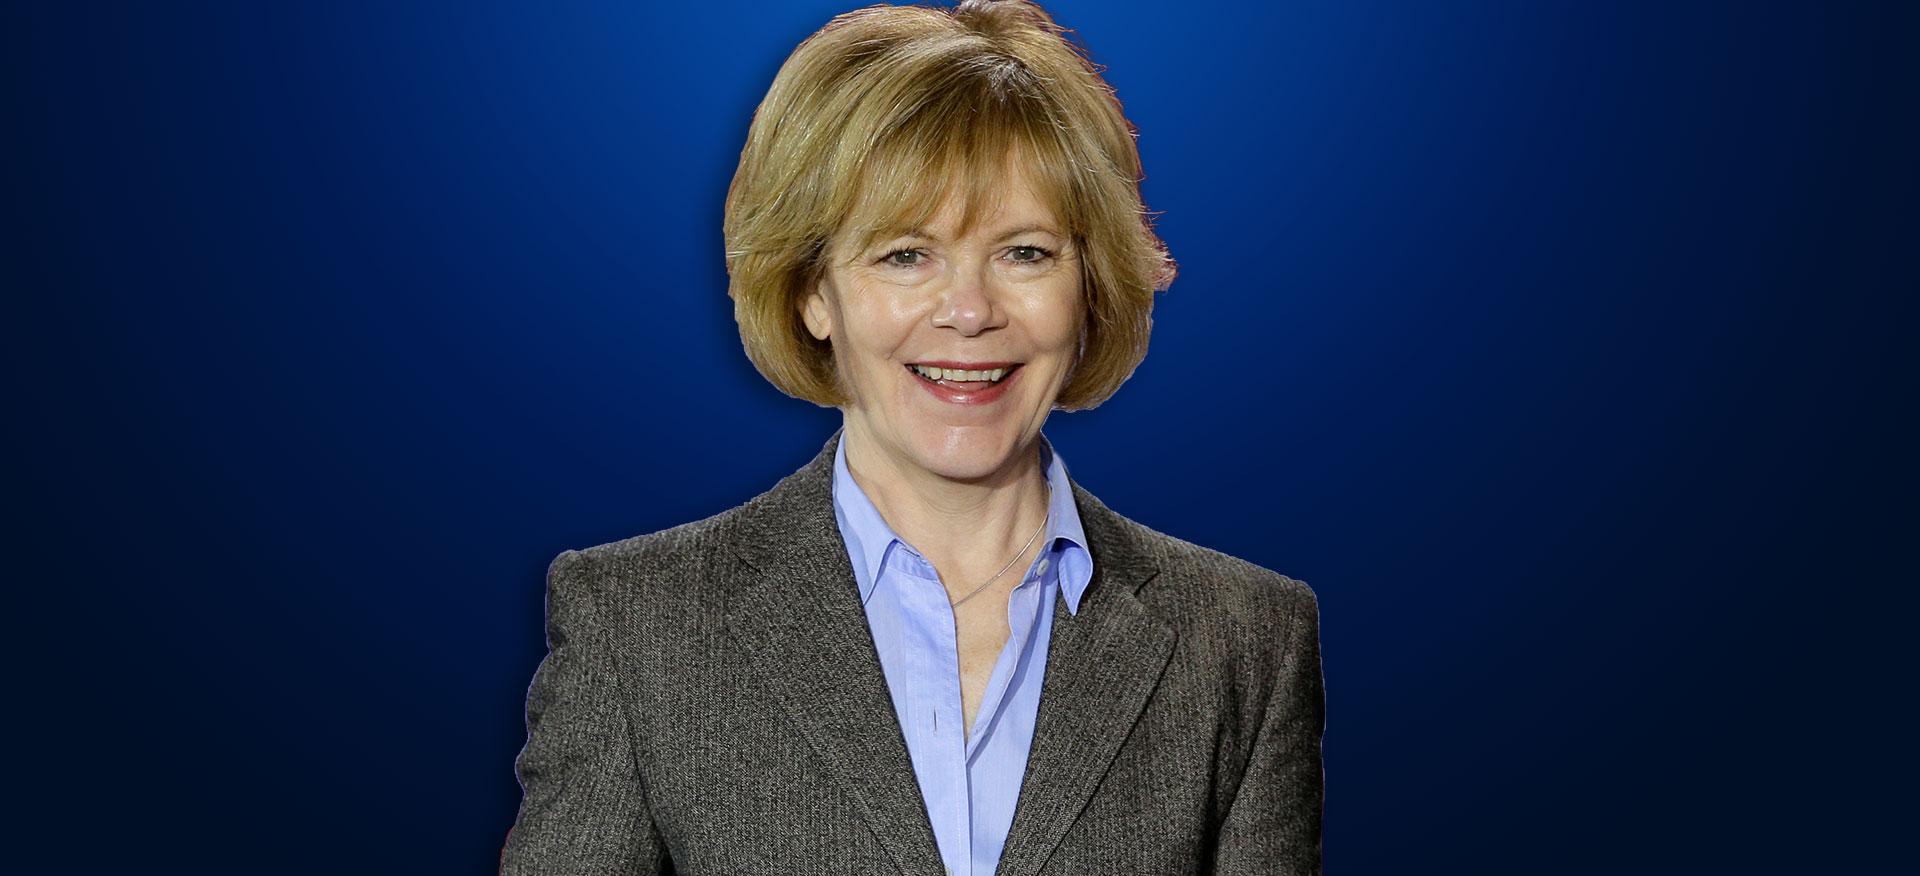 Lieutenant Governor Tina Smith